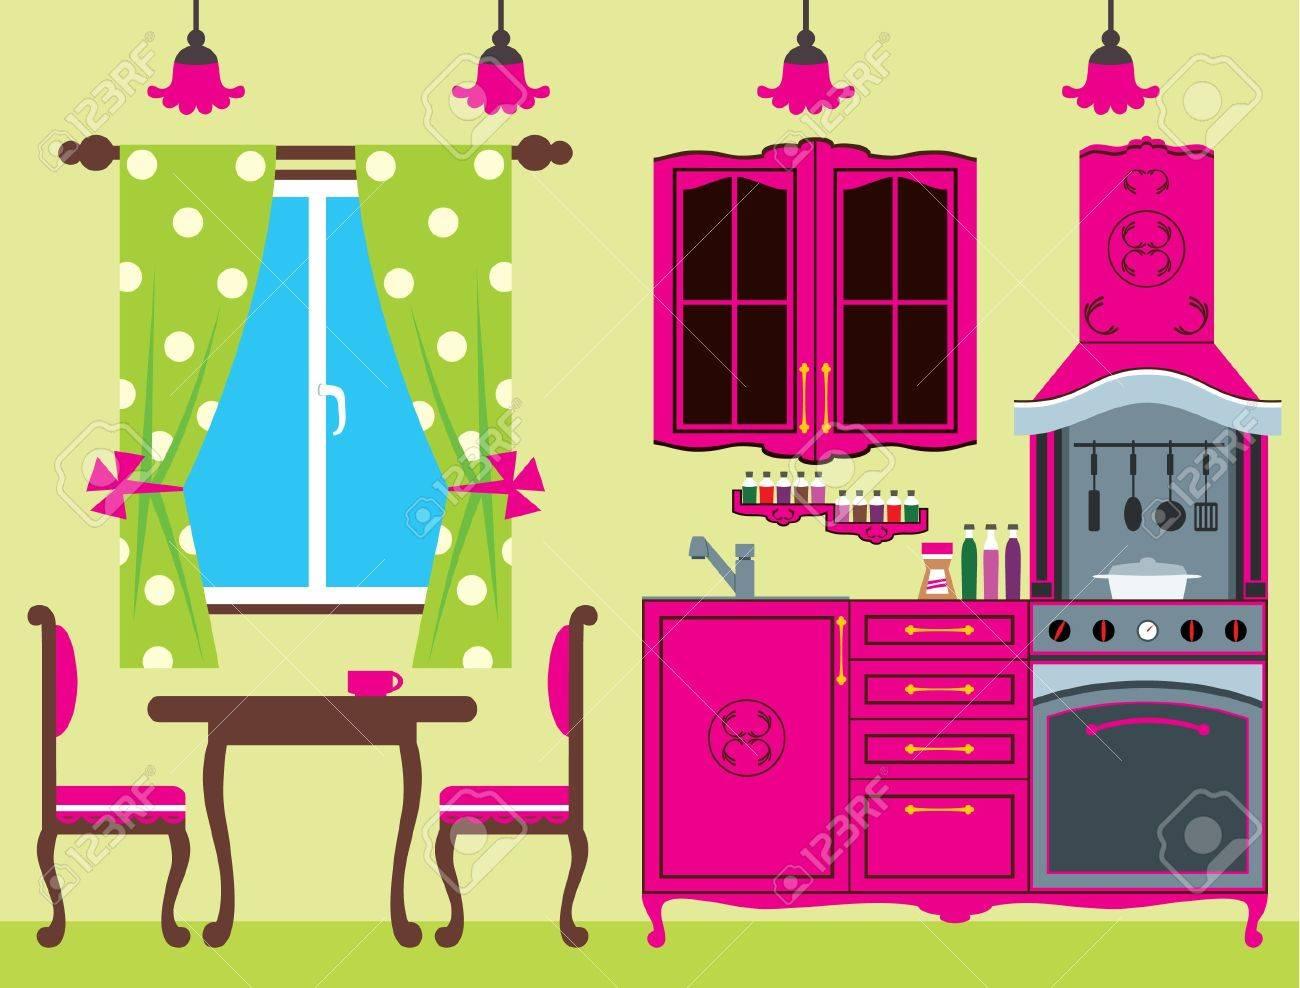 Kitchen furniture  Interior Stock Vector - 14446562